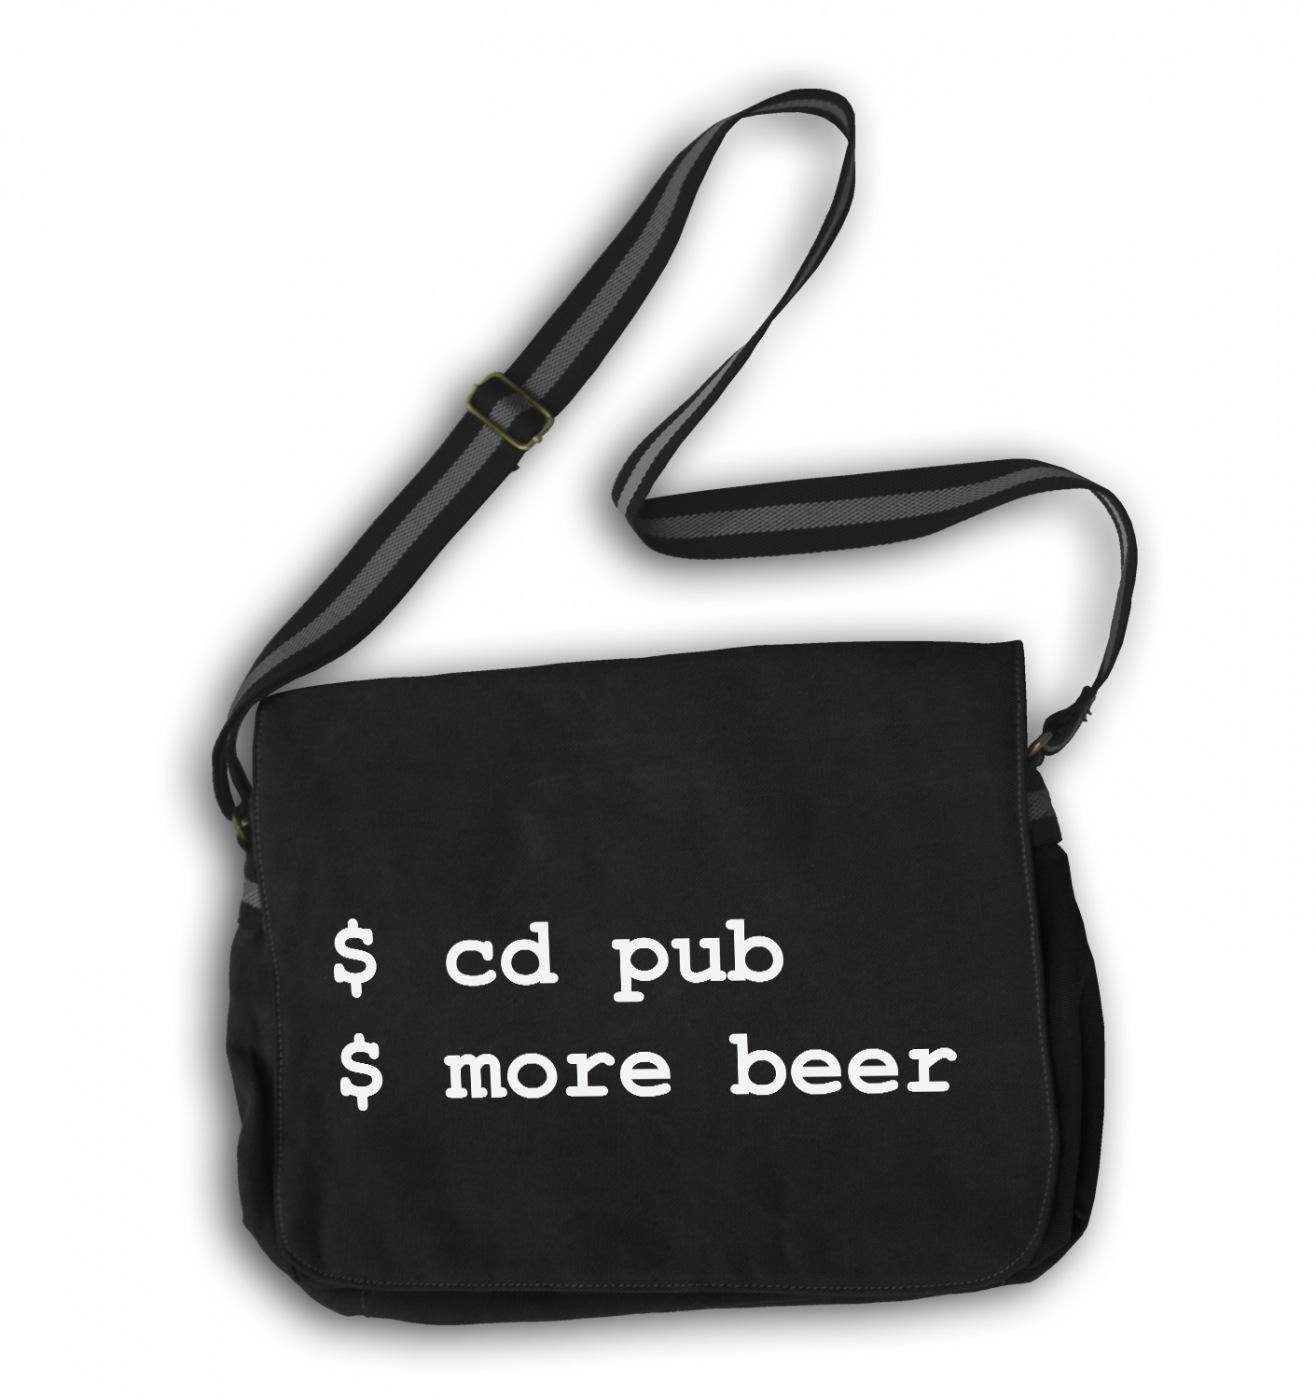 More Beer Linux messenger bag - Somethinggeeky